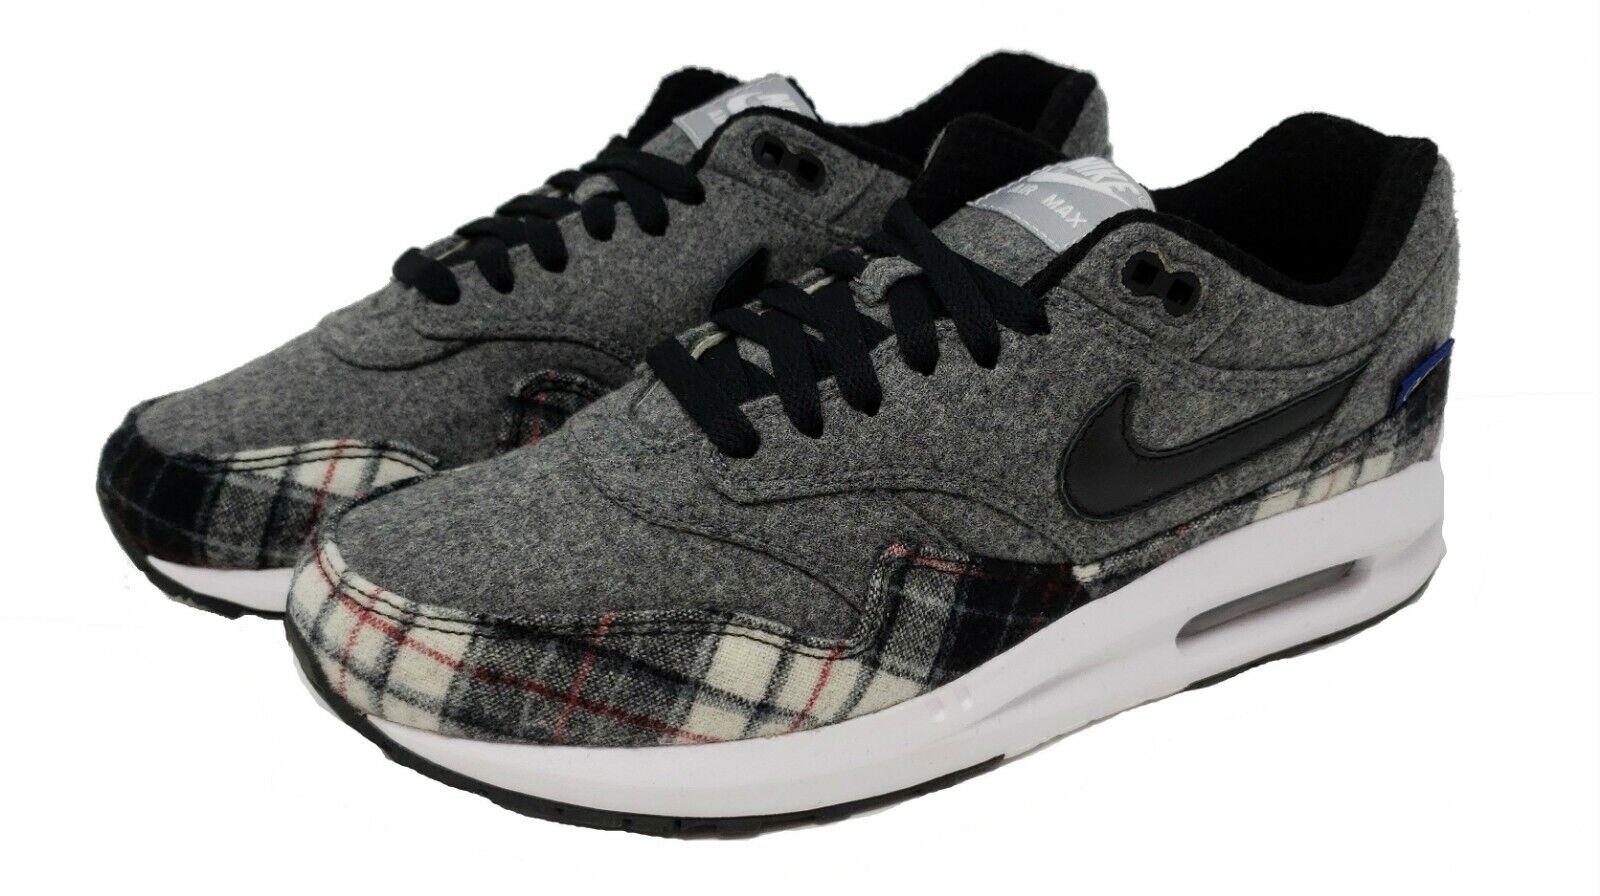 Nike ID Men's Air Max 1 Premium Running shoes Sz9 NEW 744453-992 Pendleton Wool